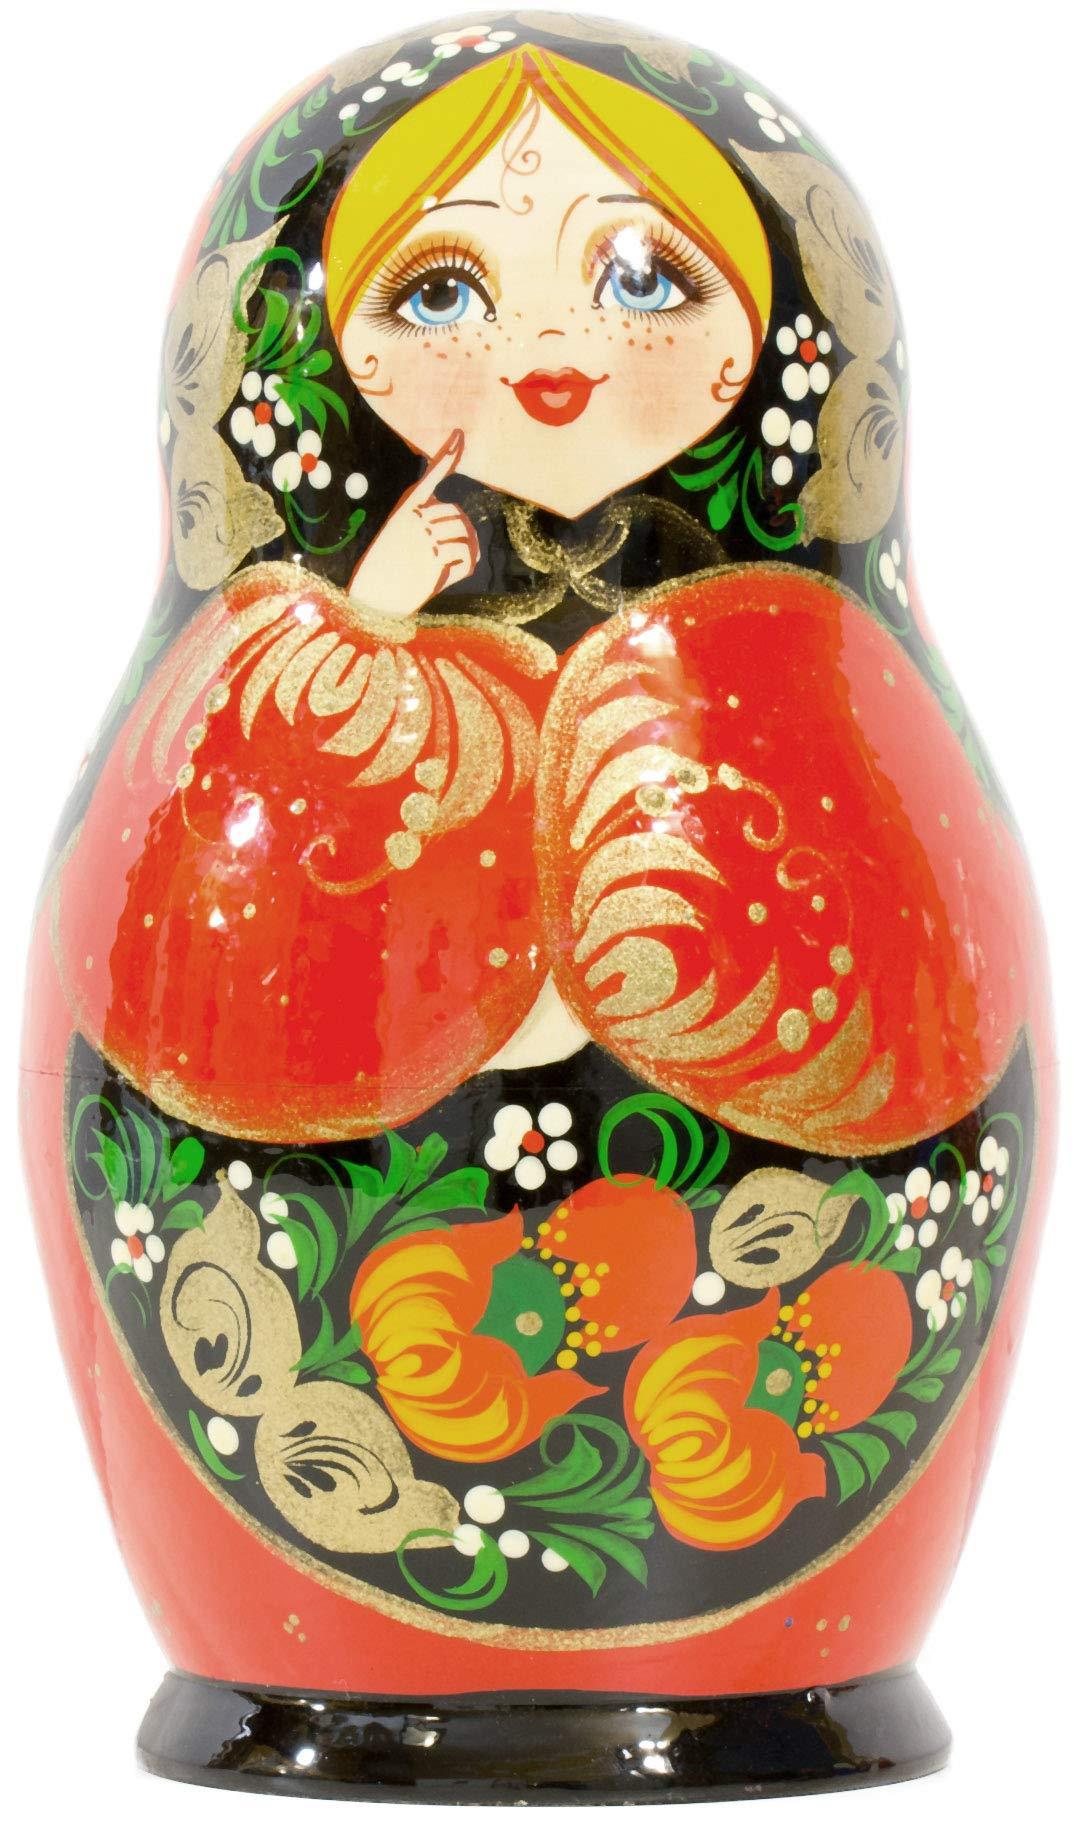 Russian Nesting Doll - Kirov - VJATKA - Hand Painted in Russia - Big Size - Wooden Decoration Gift Doll - Matryoshka Babushka (Style C, 8.25``(10 Dolls in 1)) by craftsfromrussia (Image #6)